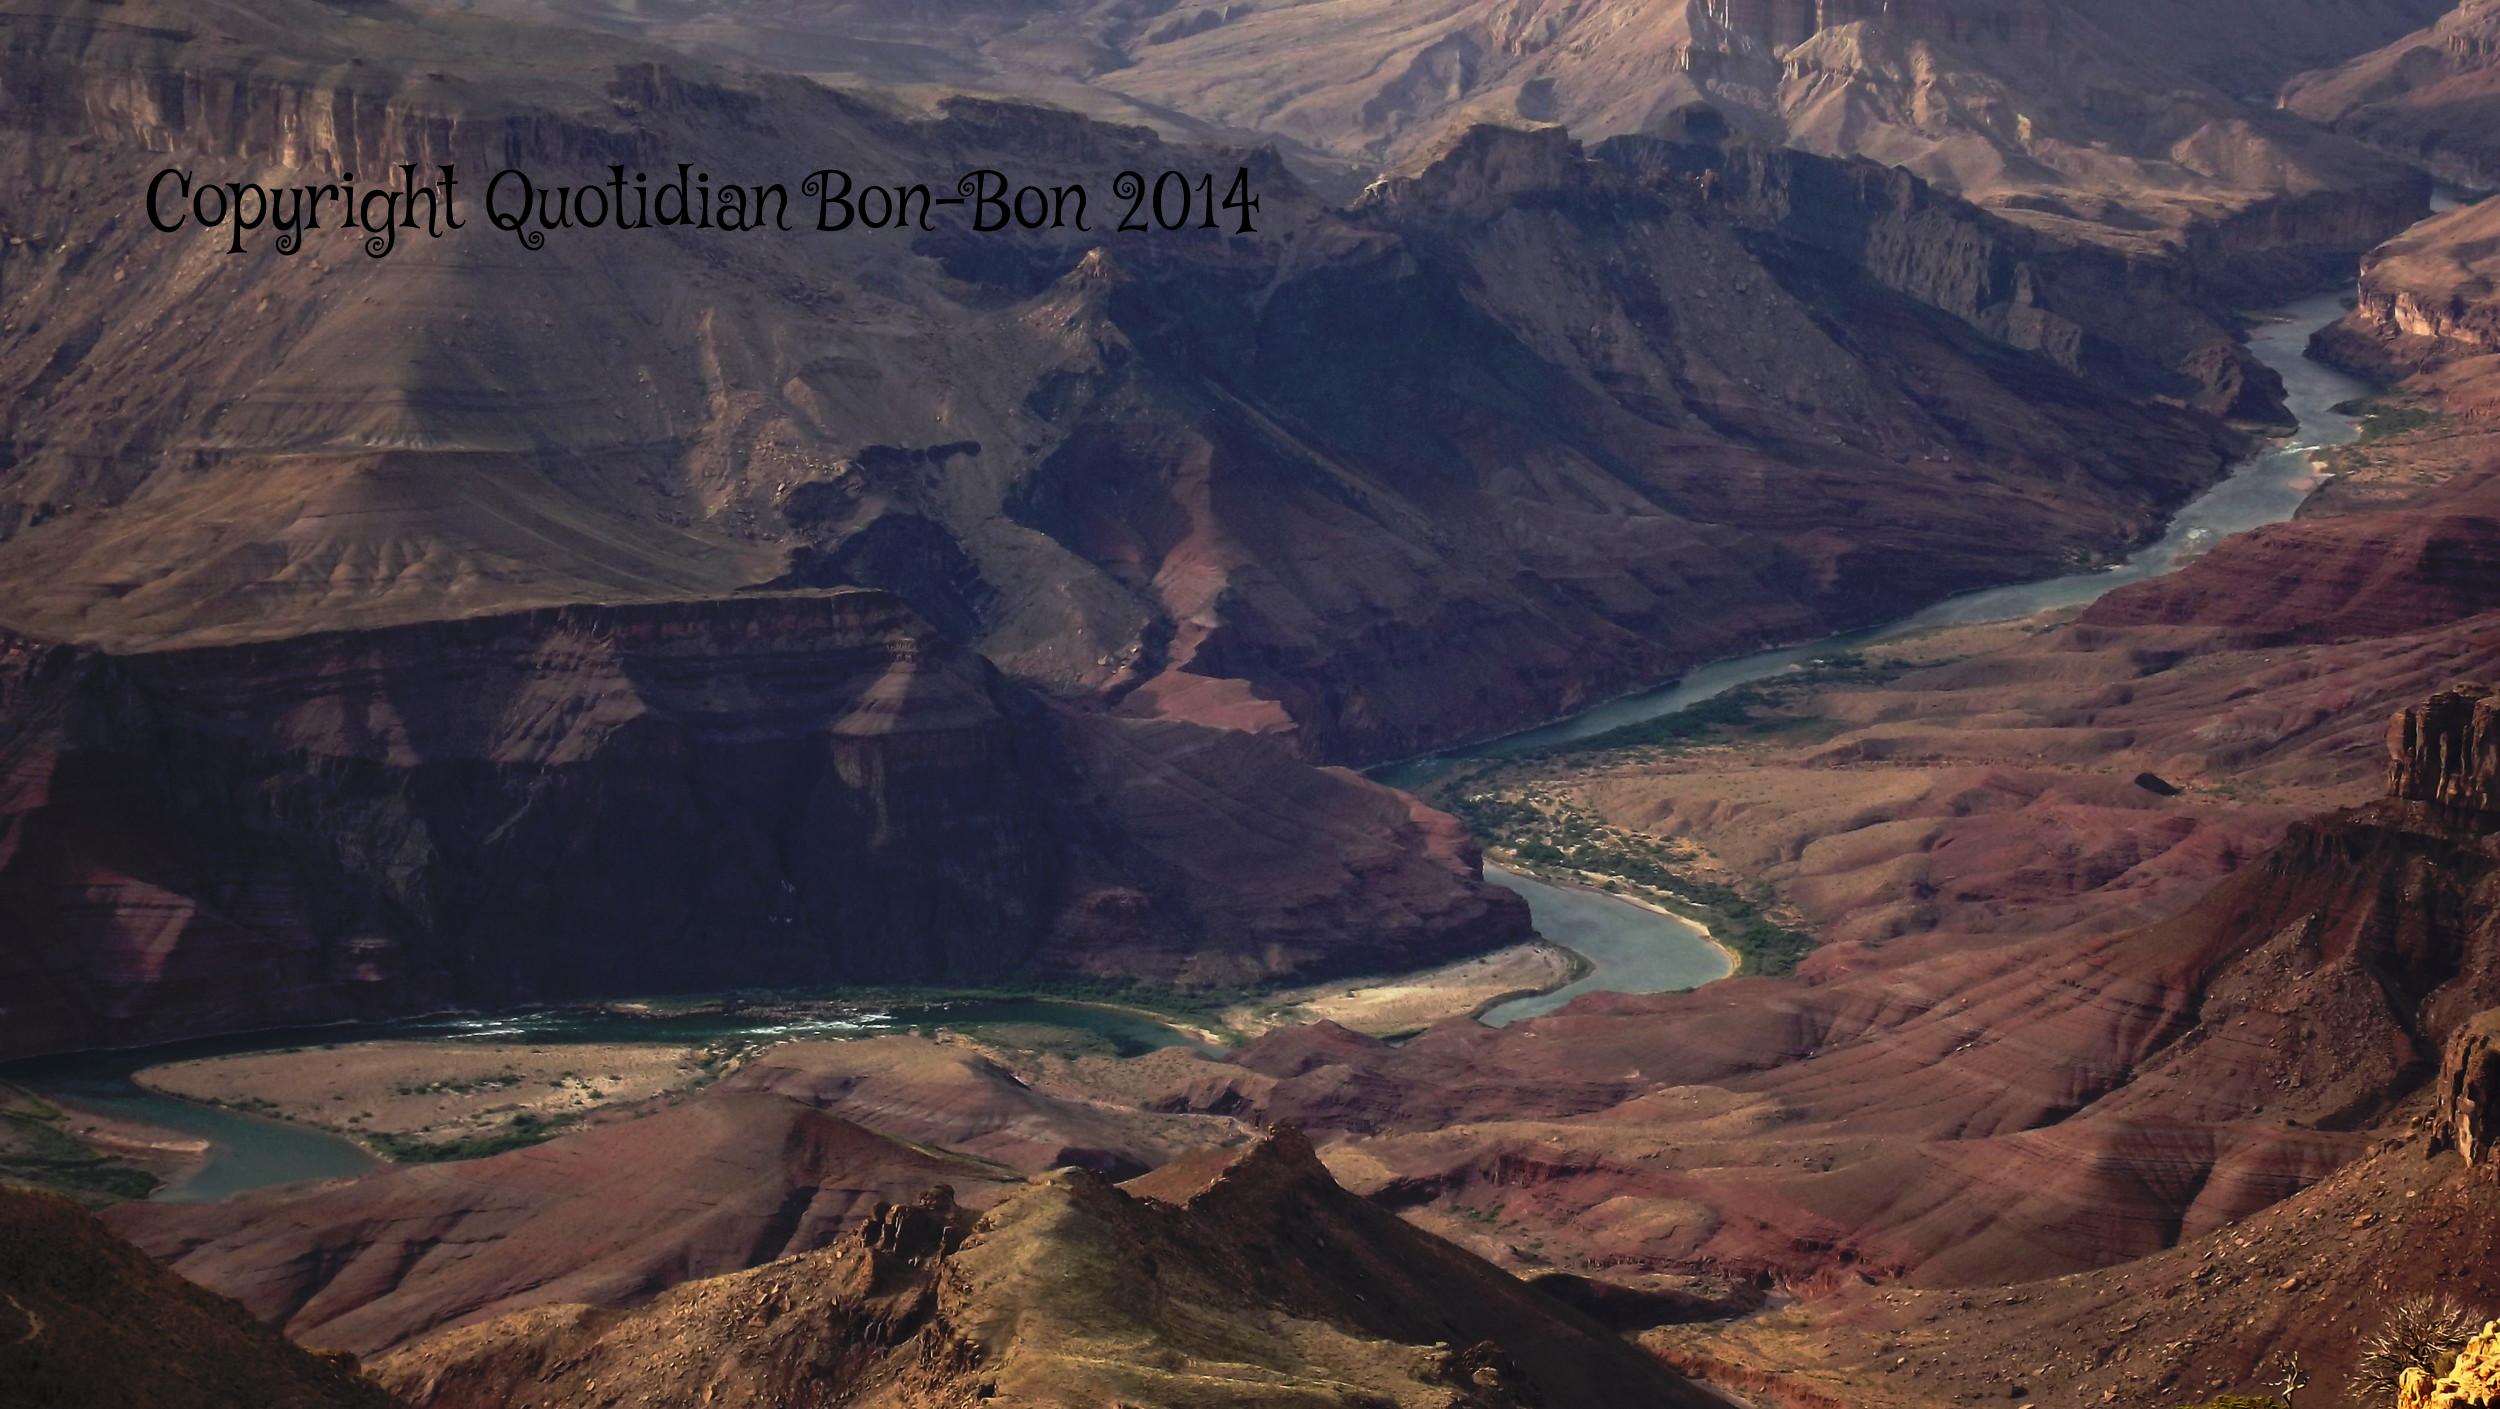 The Colorado River within the Grand Canyon, Arizona